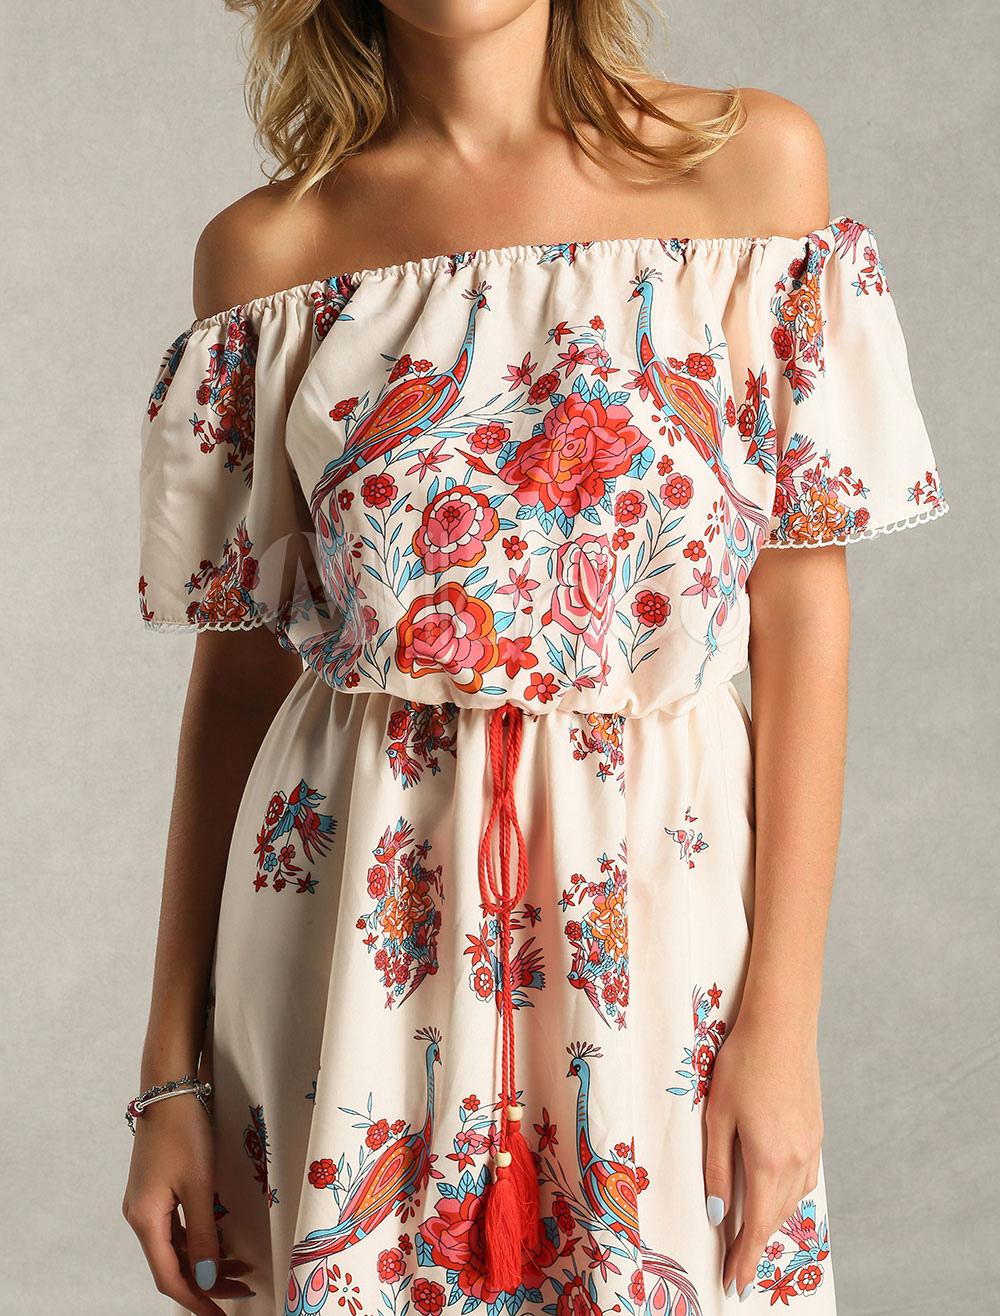 Boho kleid carmen ausschnitt gedruckt sommerkleid - Kleider milanoo ...